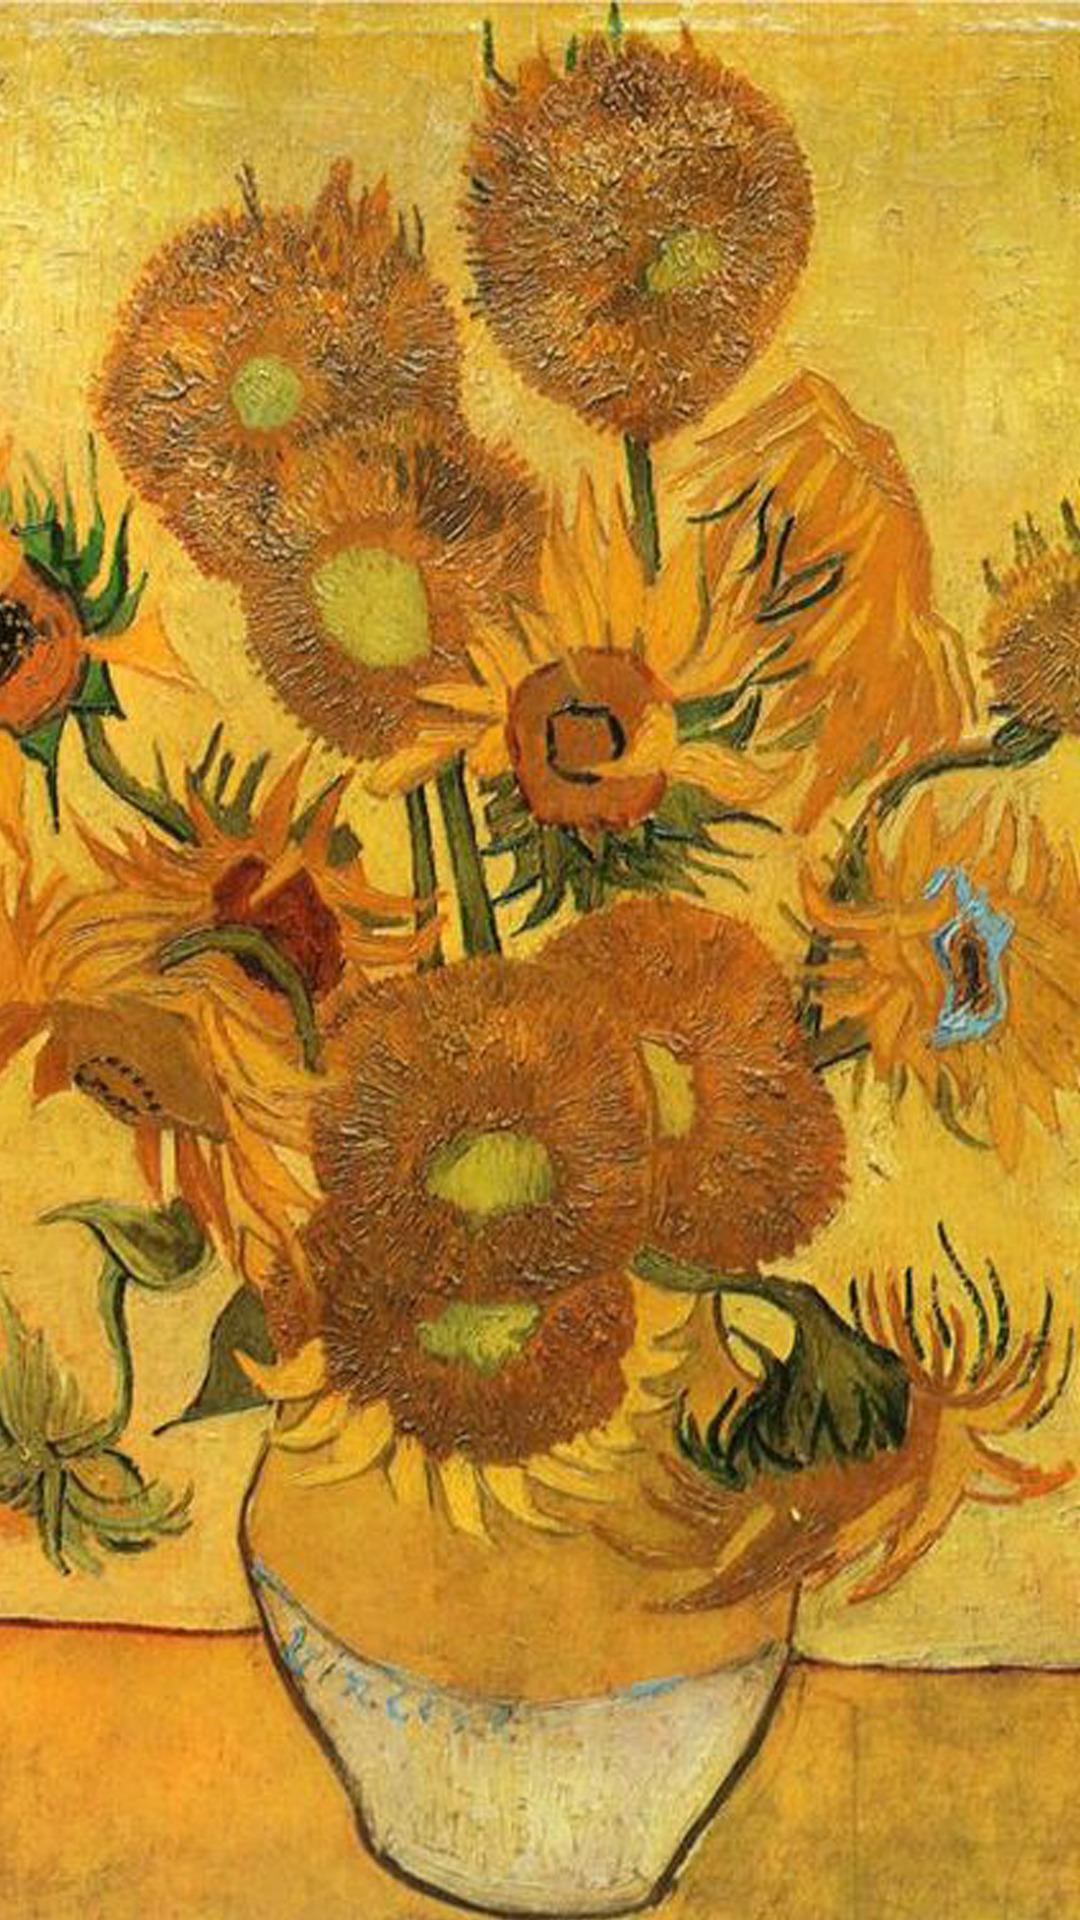 Vincent Van Gogh Quotes Wallpaper Hippie Vintage Indie Grunge Pastel Backgrounds Van Gogh